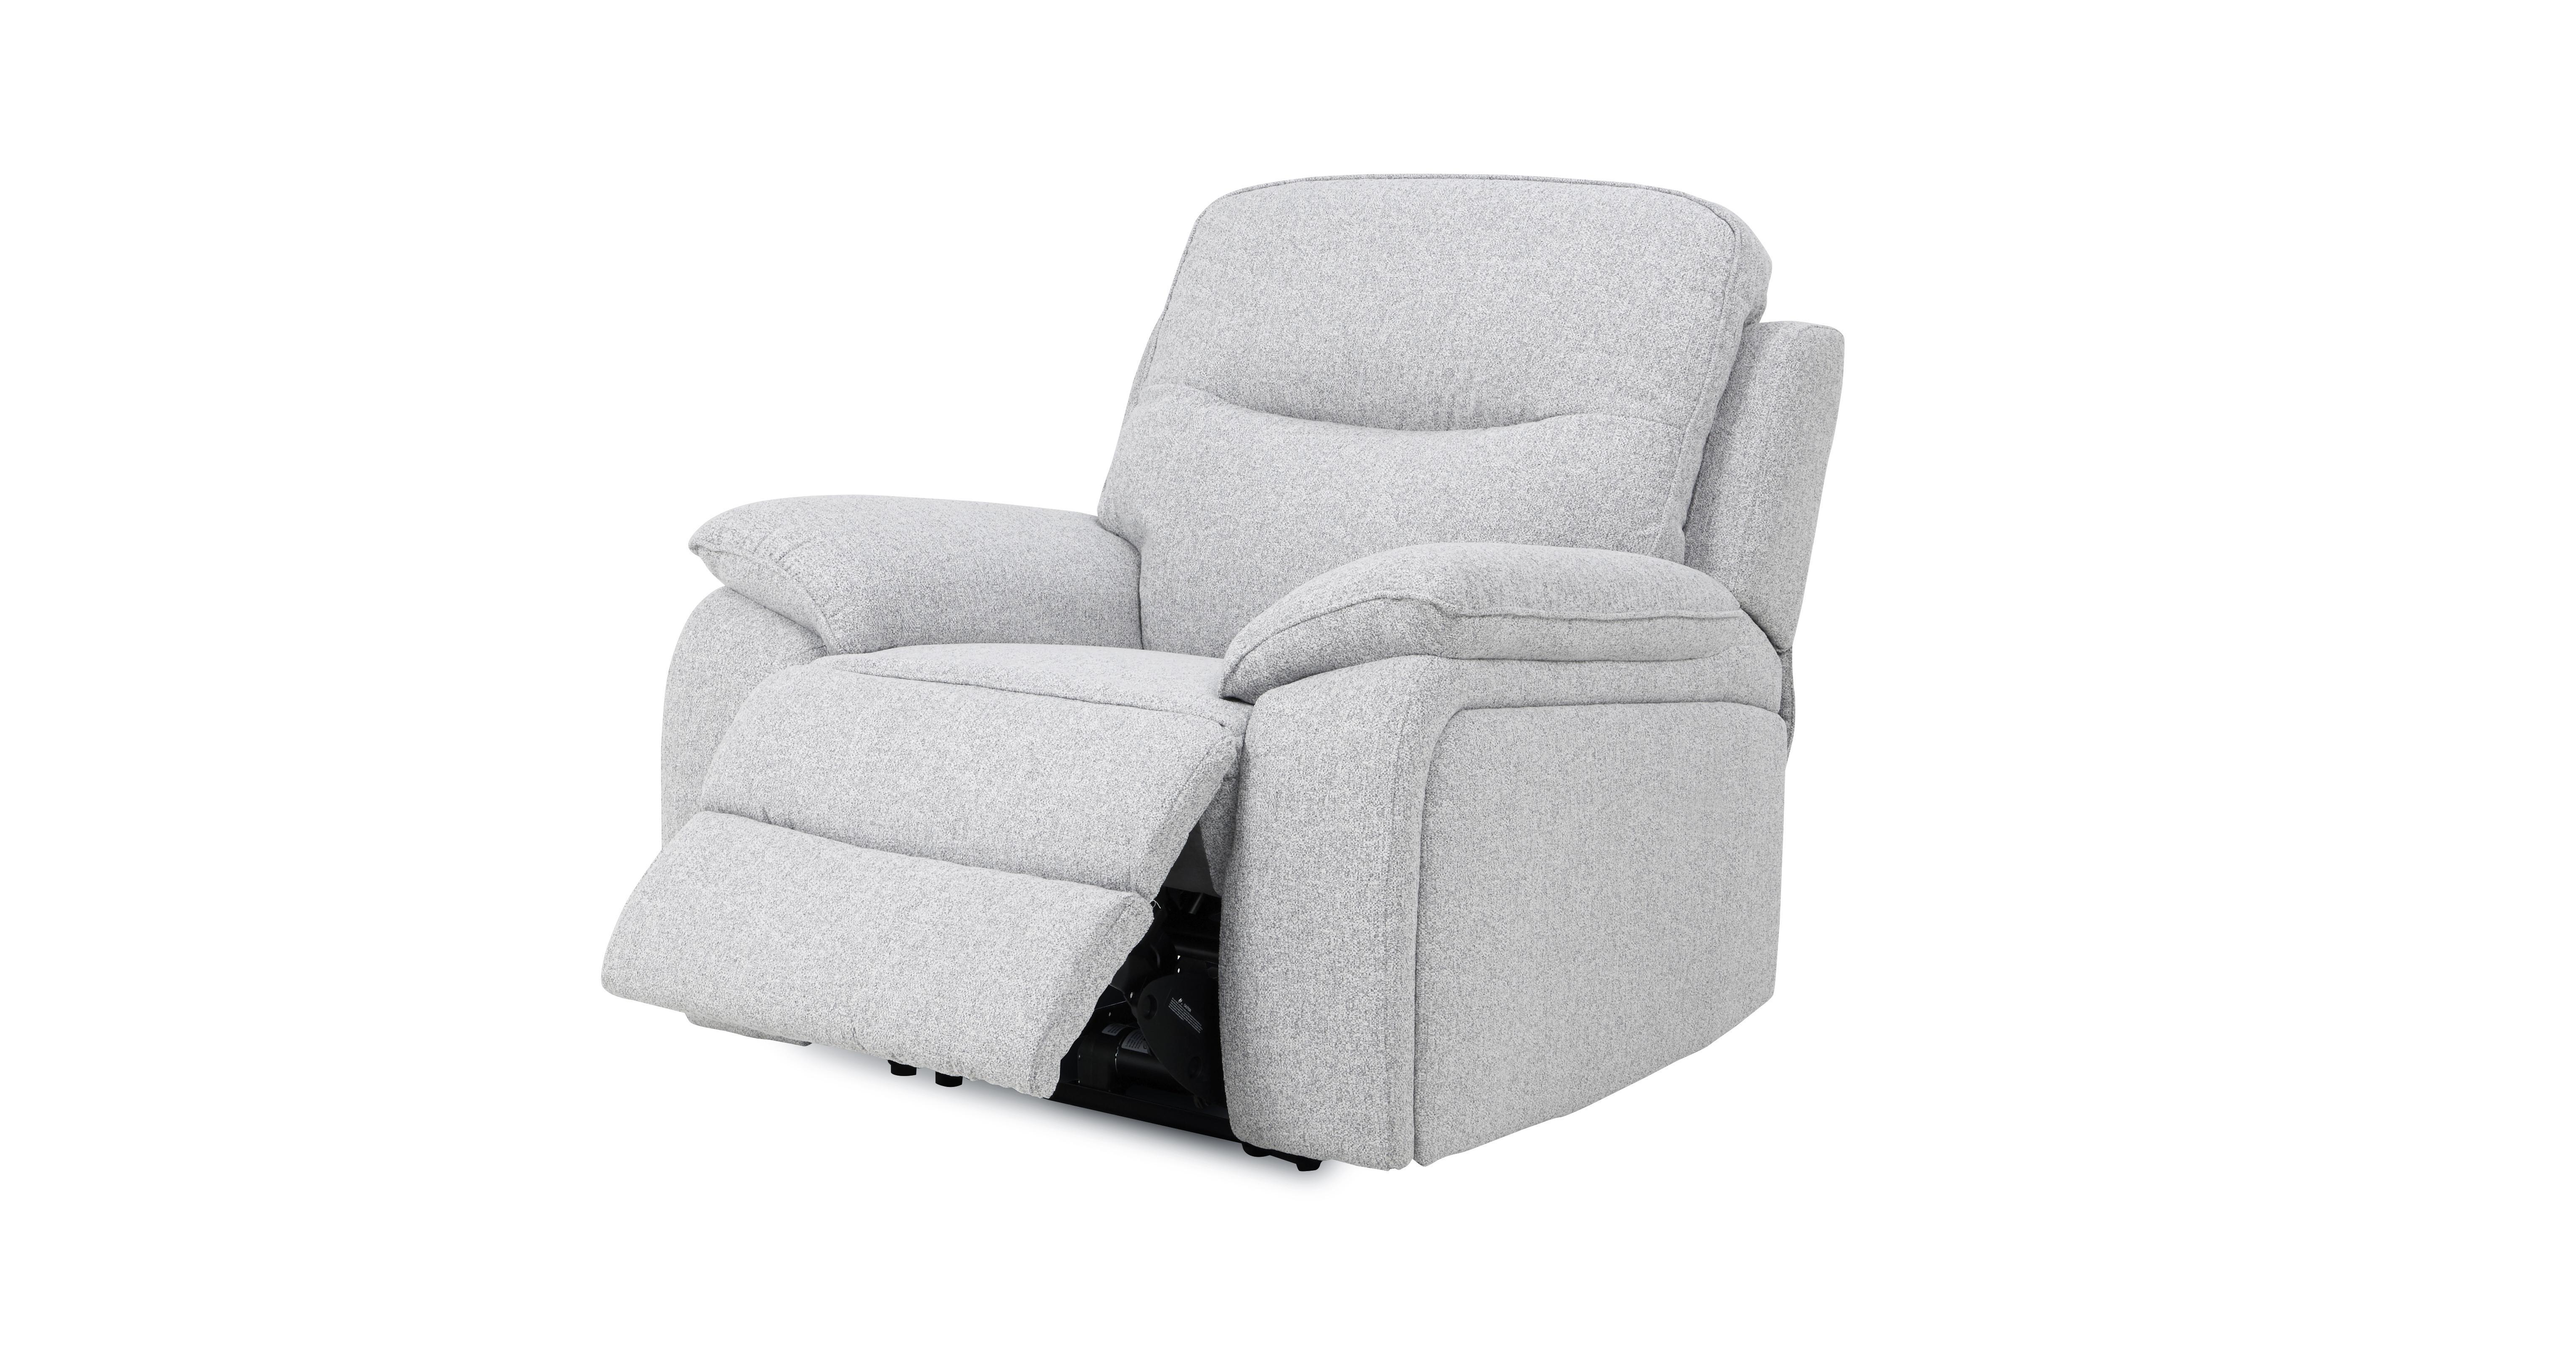 grey leather recliner chair uk ergonomic marina square dfs superb silver fabric set 3 2